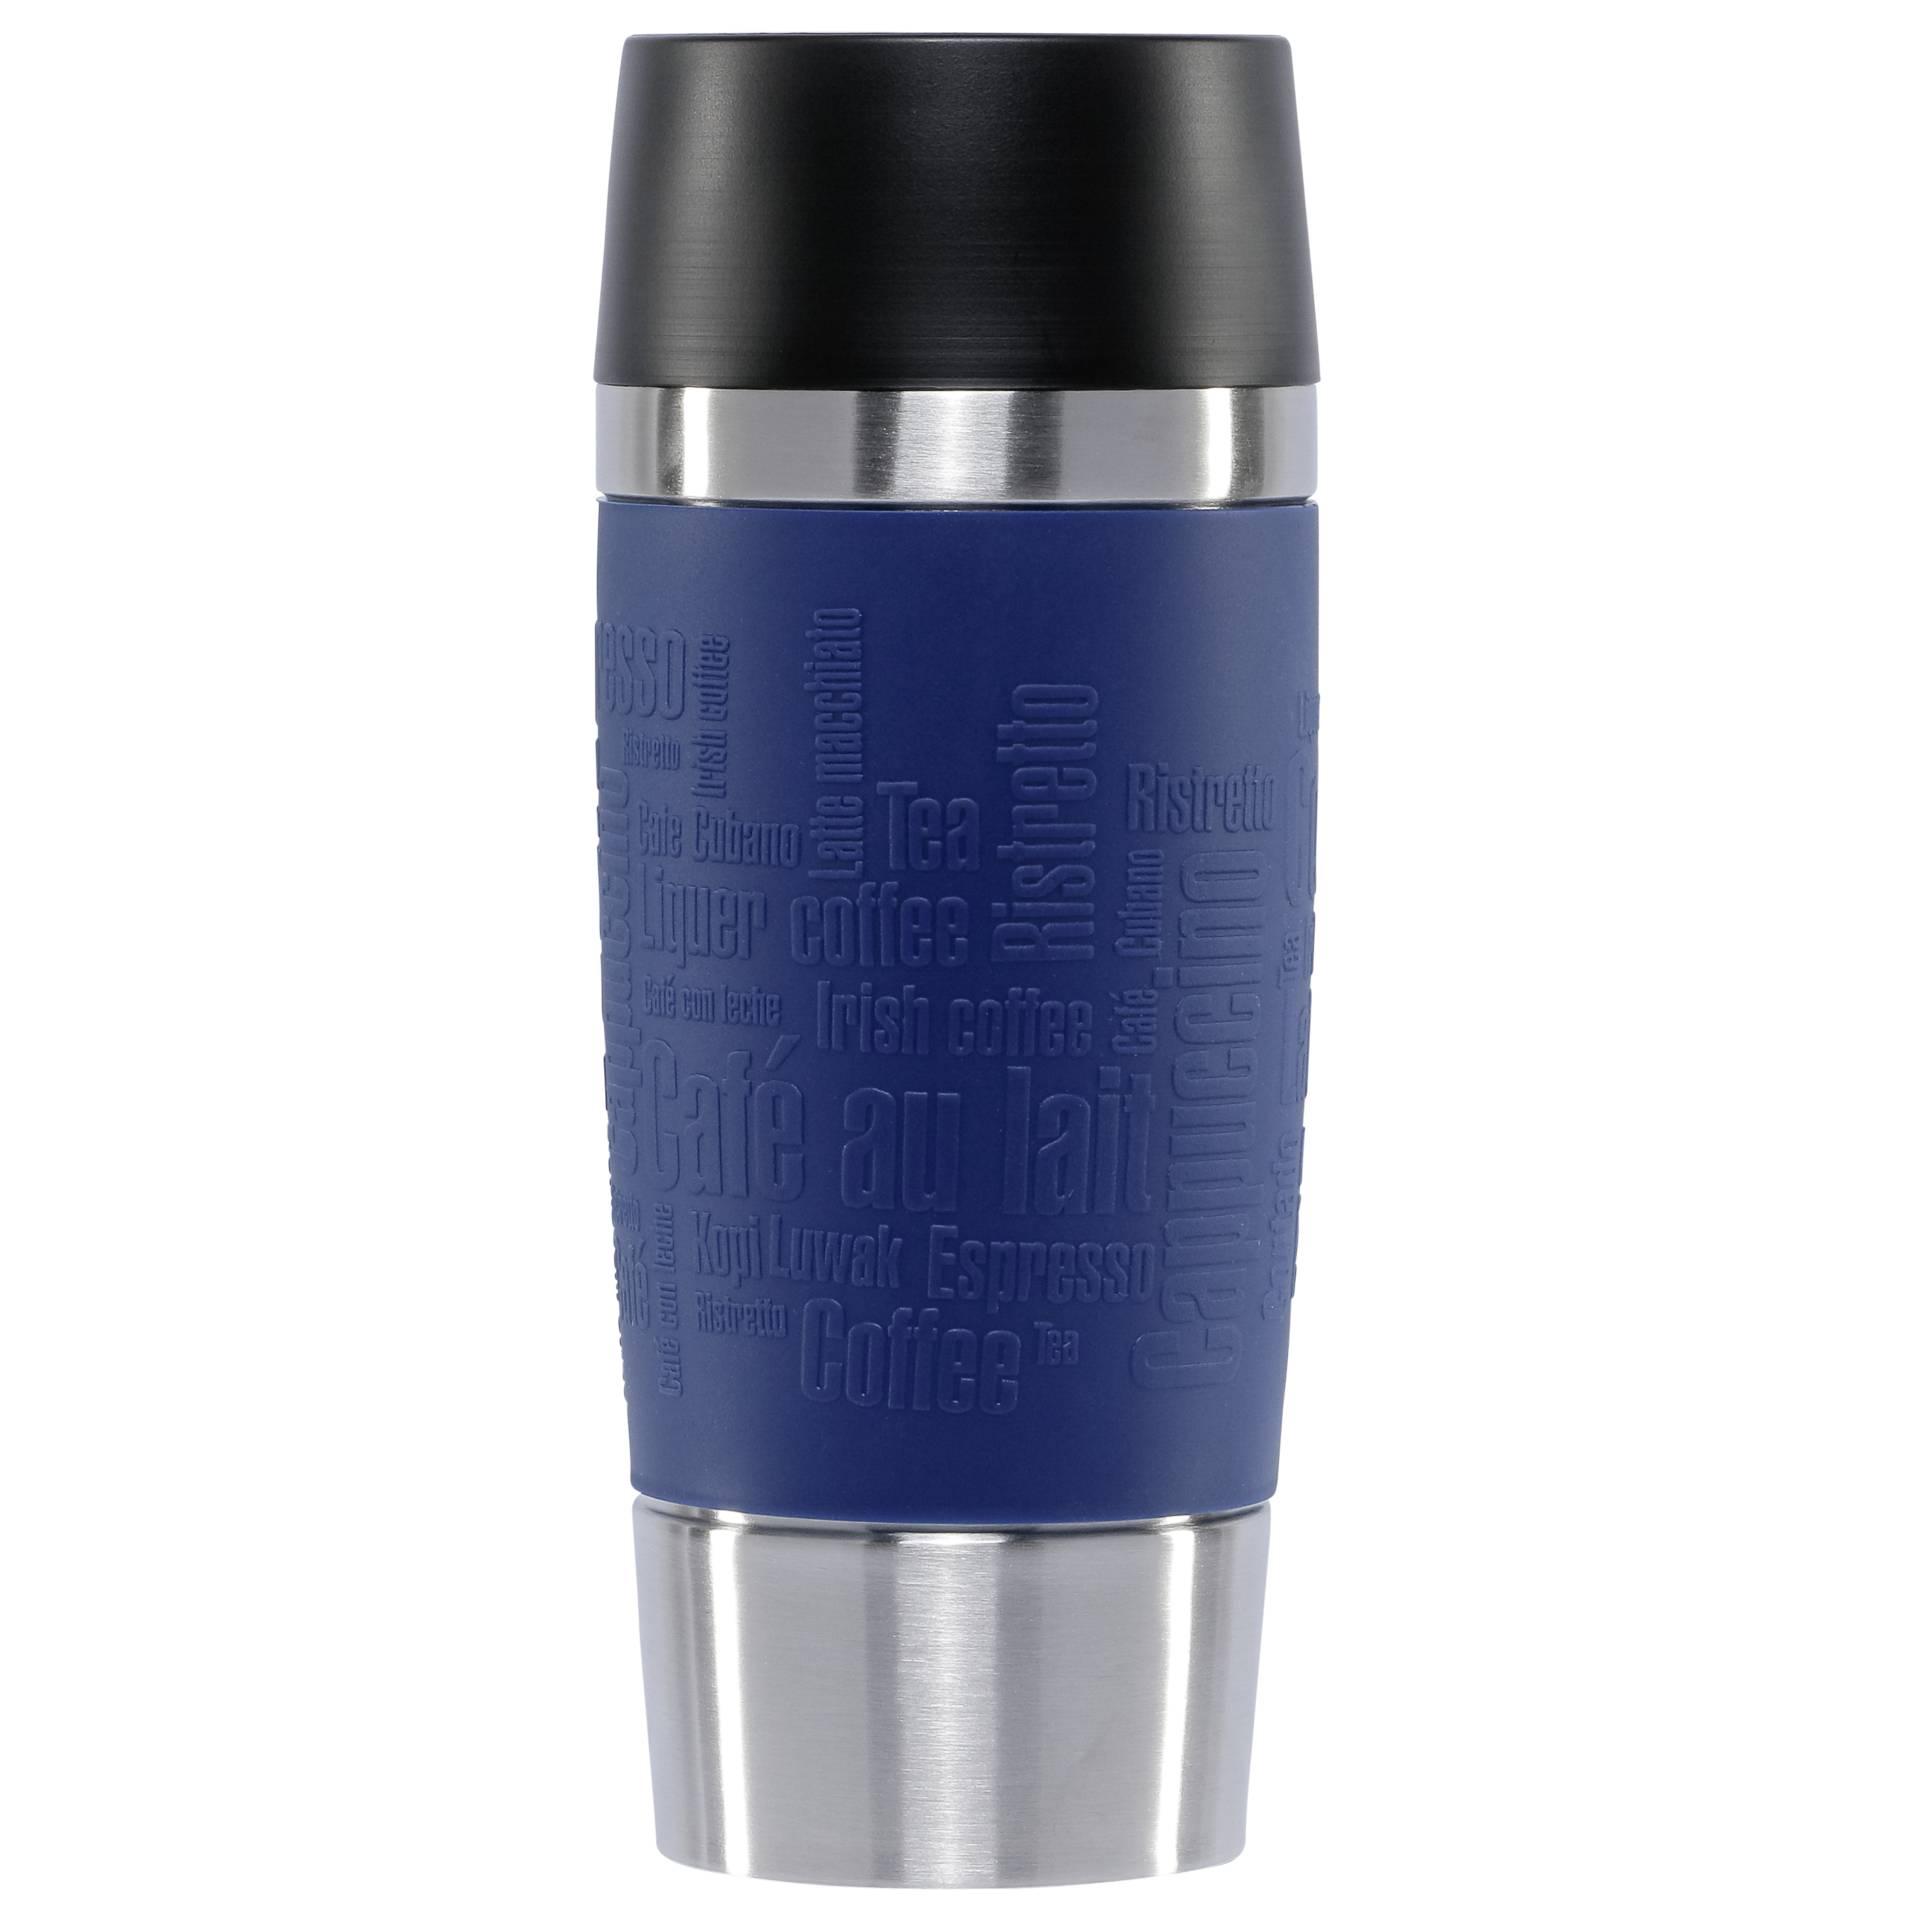 Emsa Isolierbecher Travel Mug 0 36 Liter Manschette Blau Hochwertiger Vakuumisolierter Edelstahlkorper Spul 1 St Uum Emsa Hardware Electronic Grooves Land Playthek